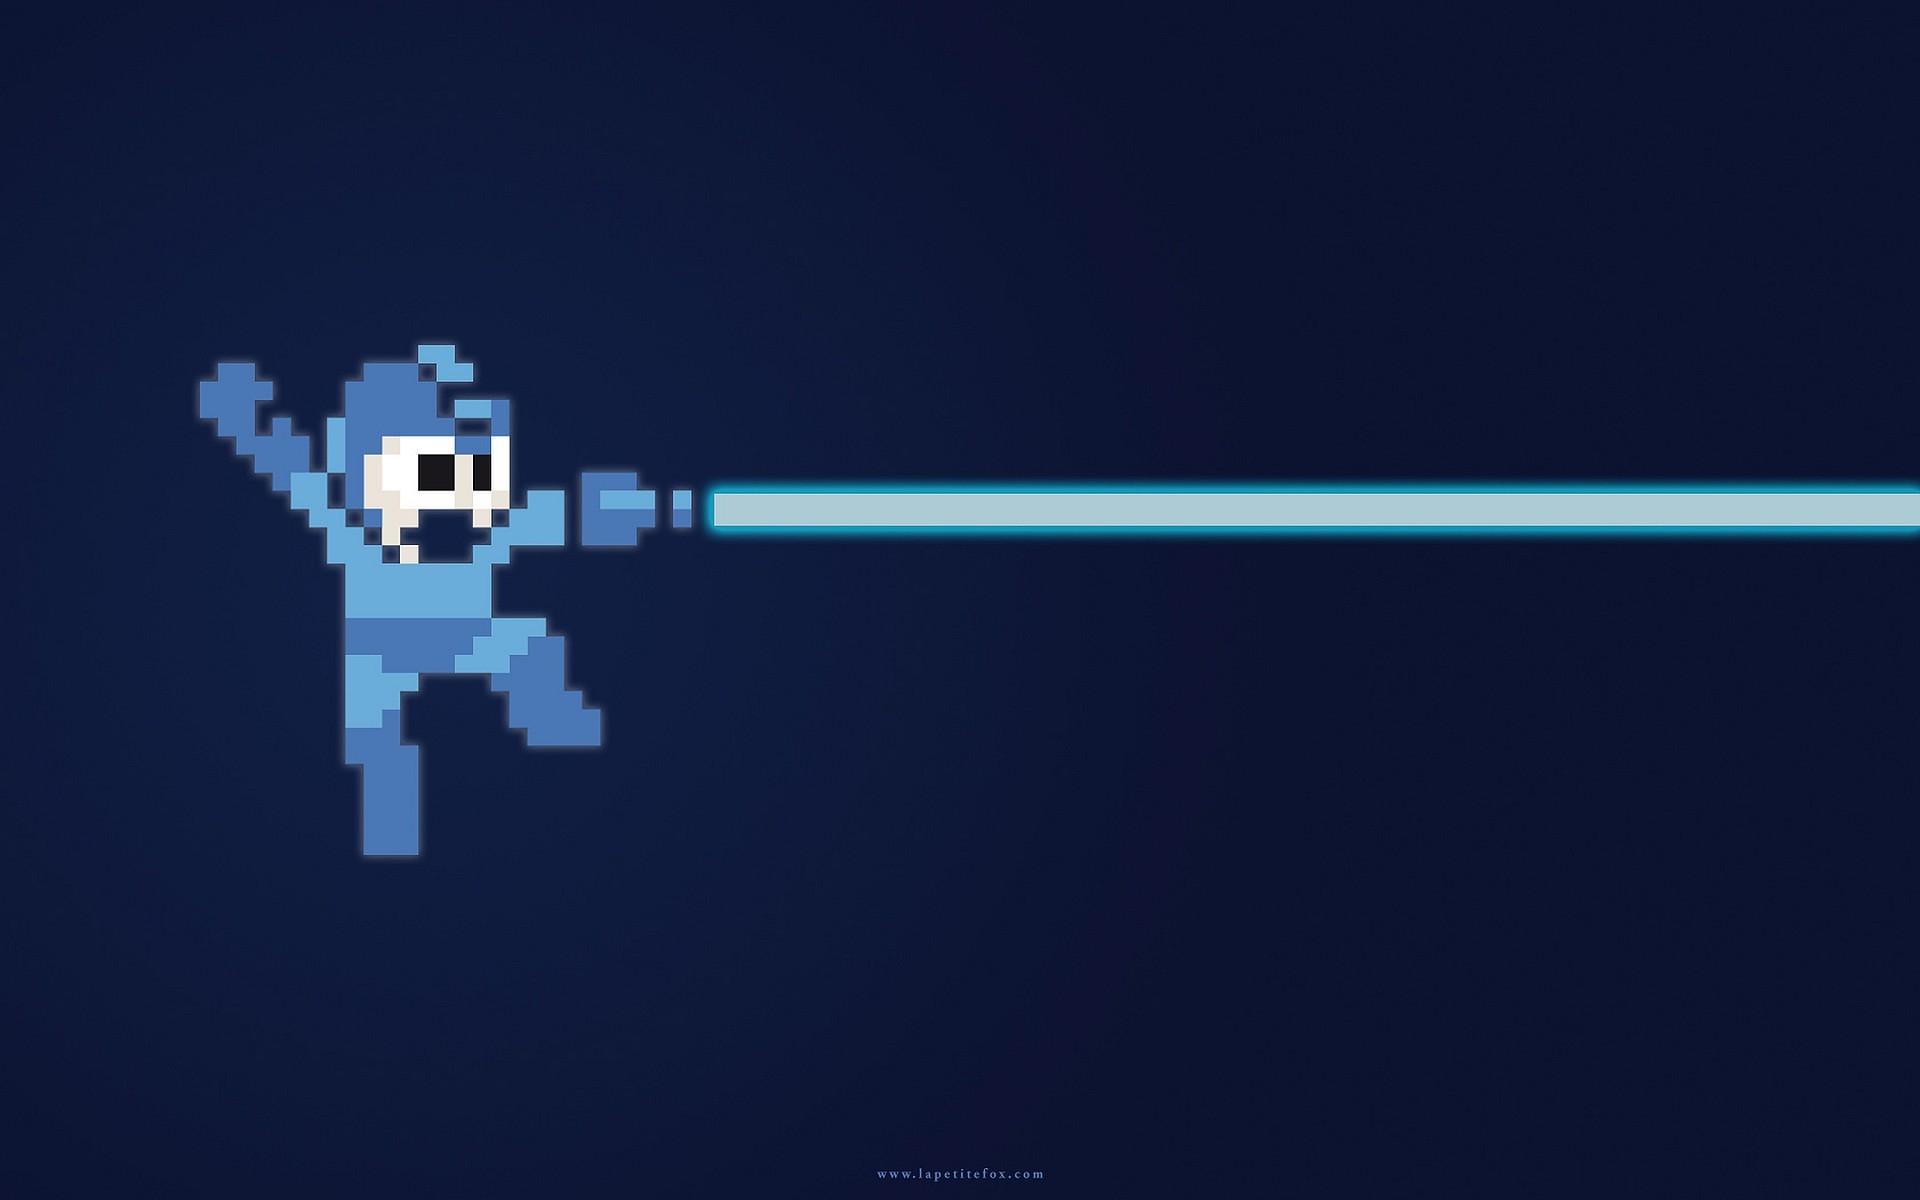 Video Game – Mega Man Wallpaper